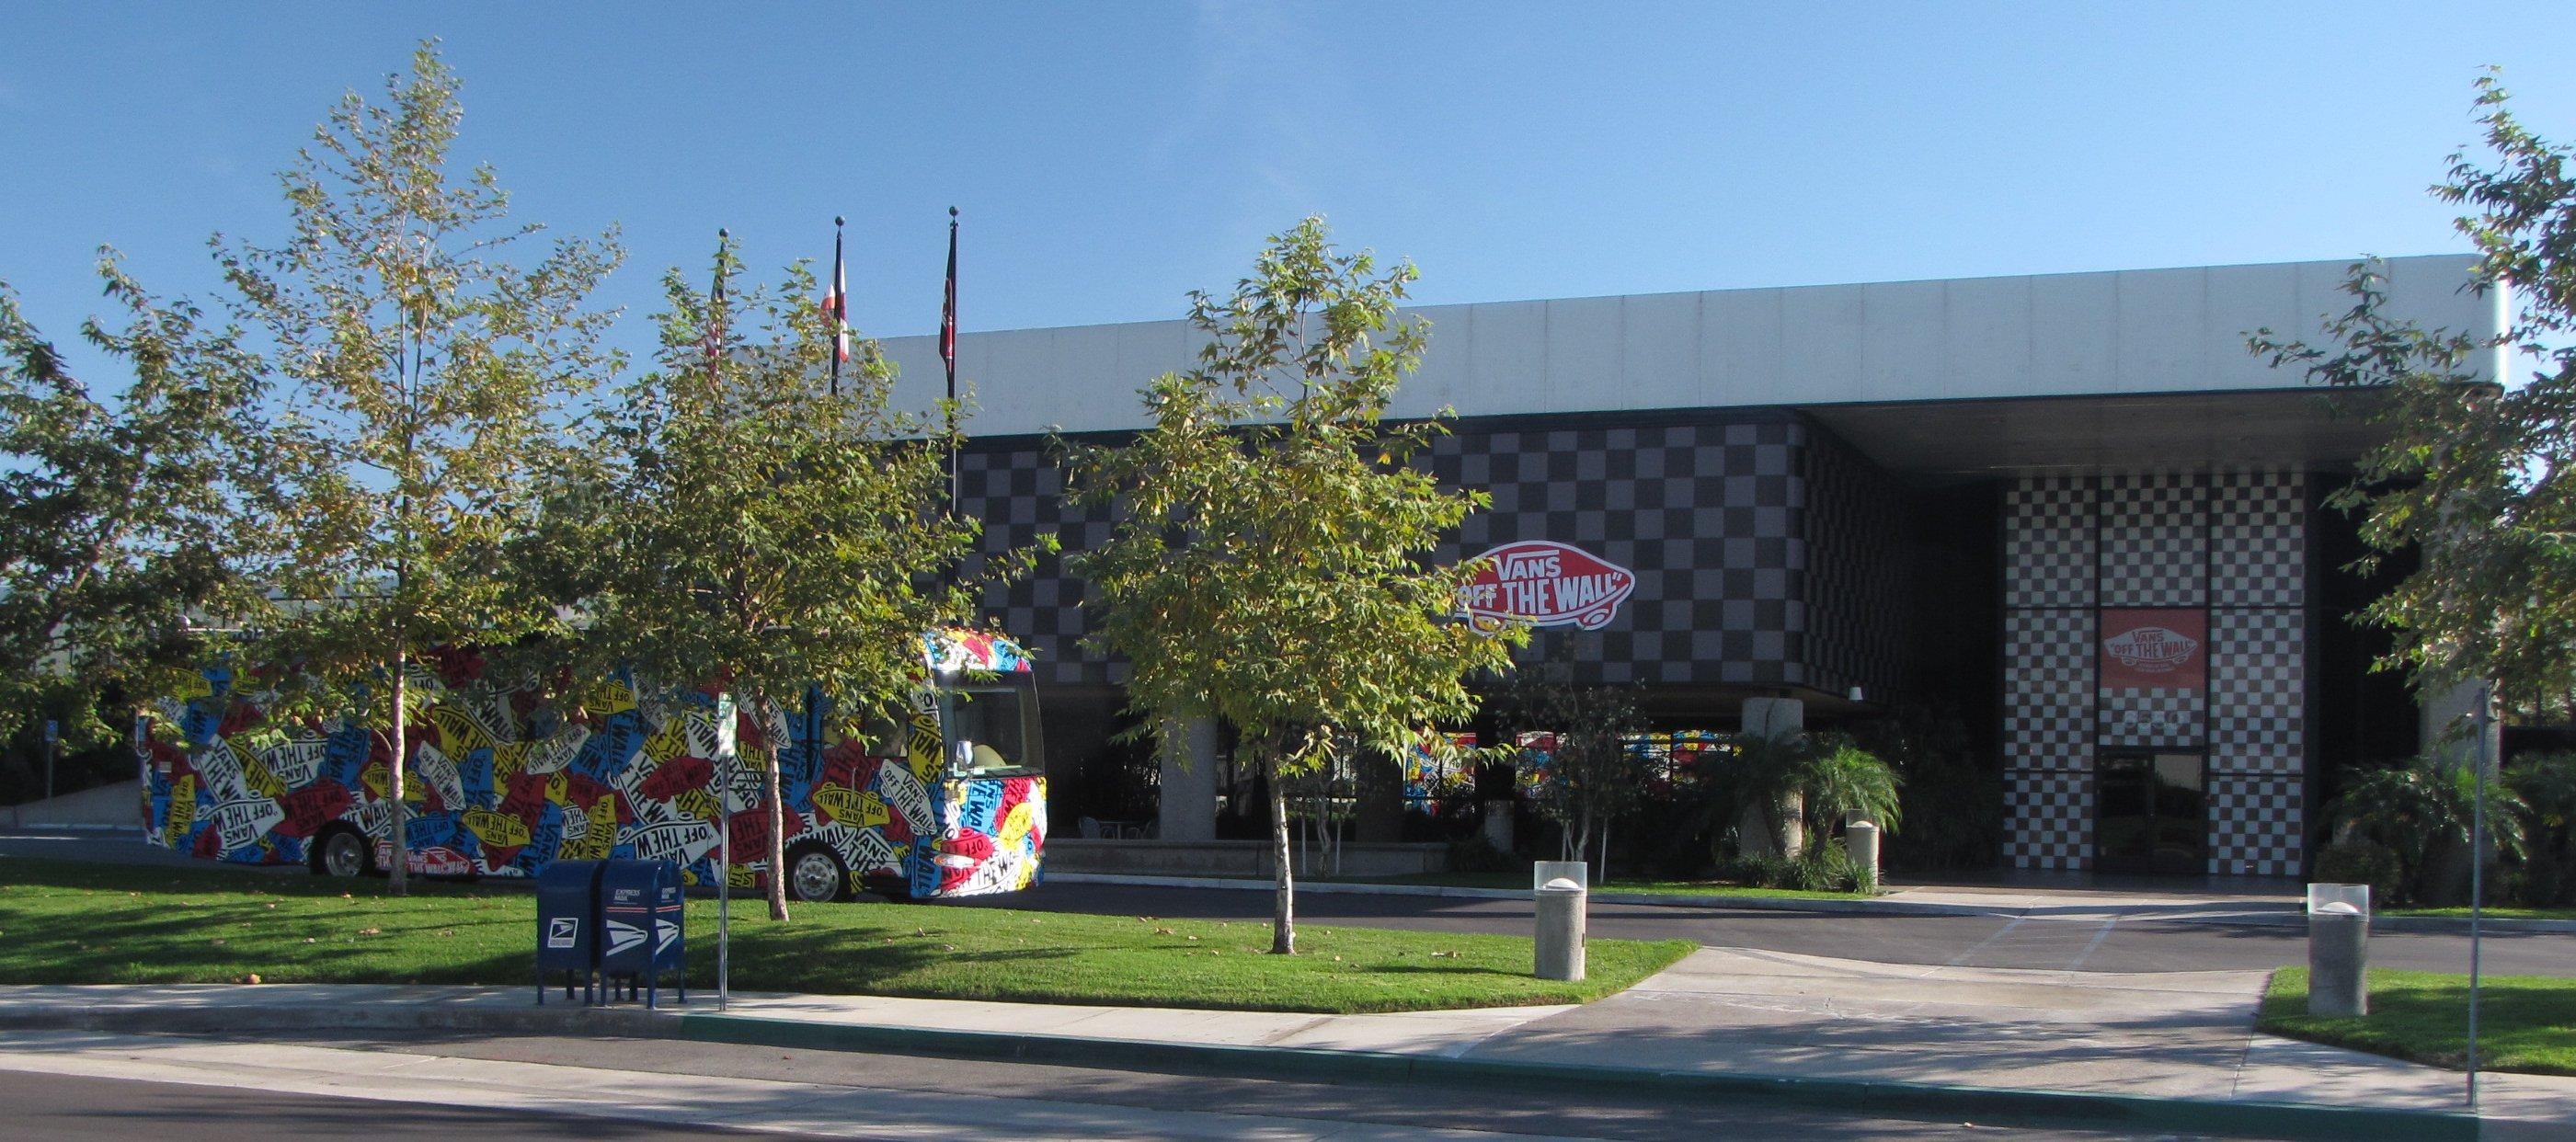 vans corporate headquarters